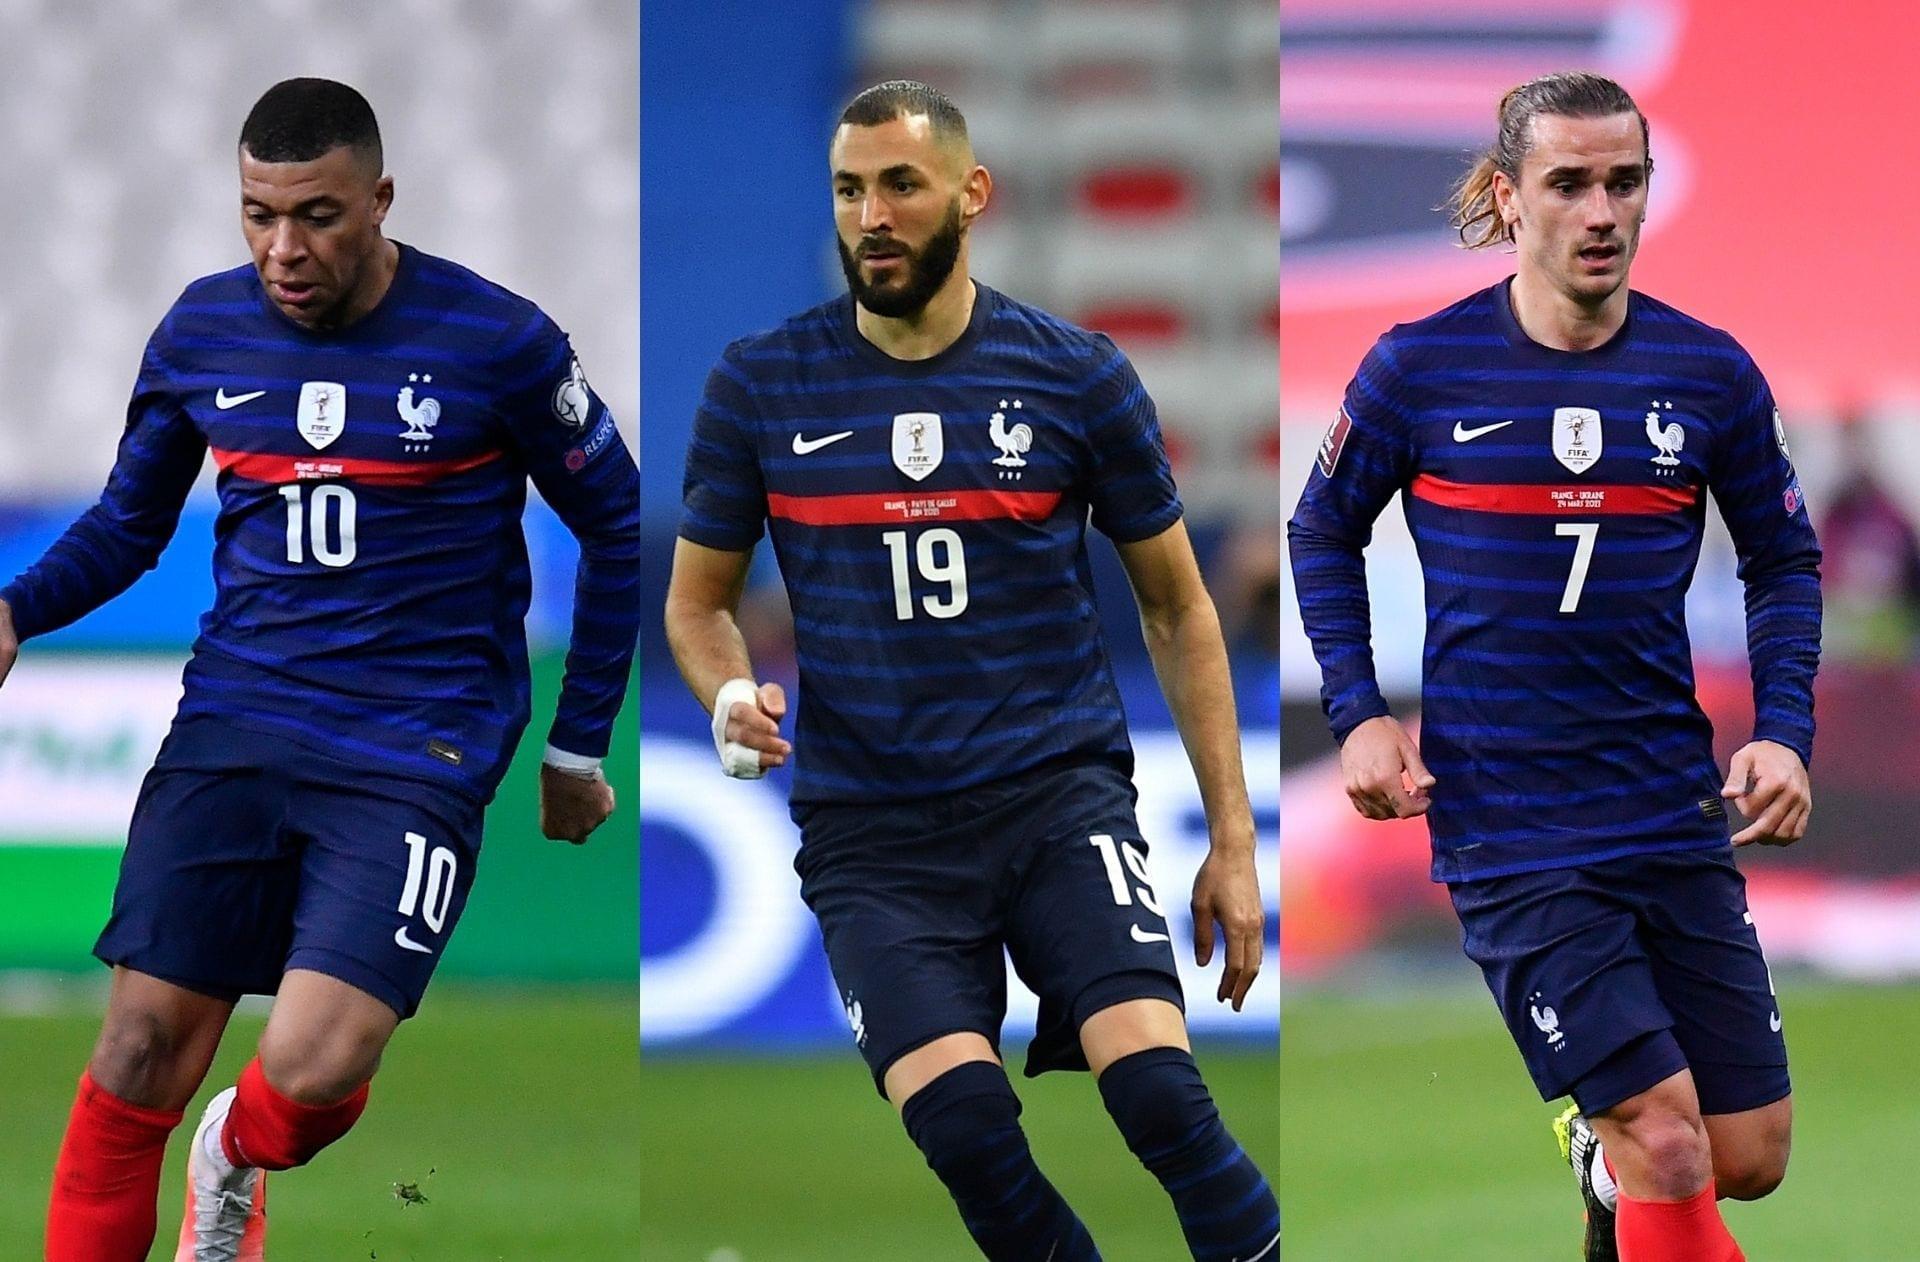 Kylian Mbappe, Karim Benzema, Antoine Griezmann - France